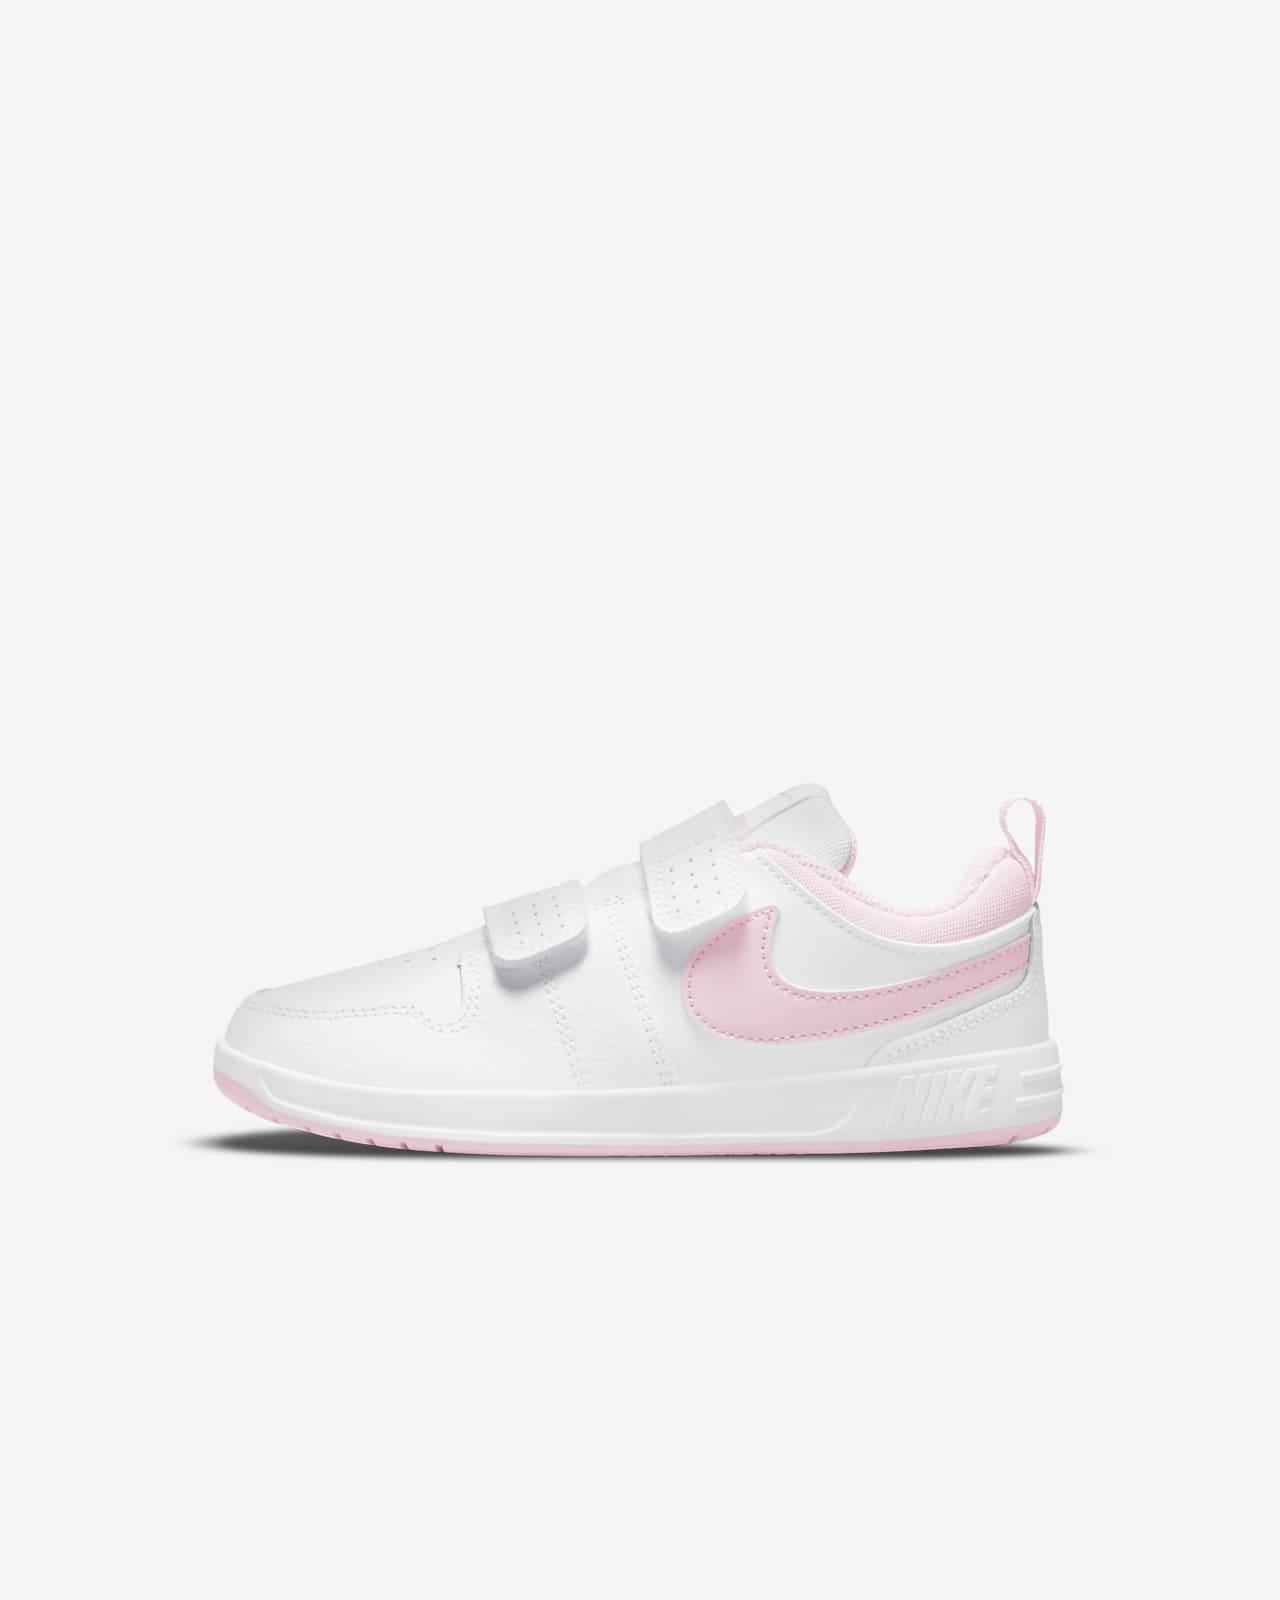 Nike Pico 5 Kleuterschoen